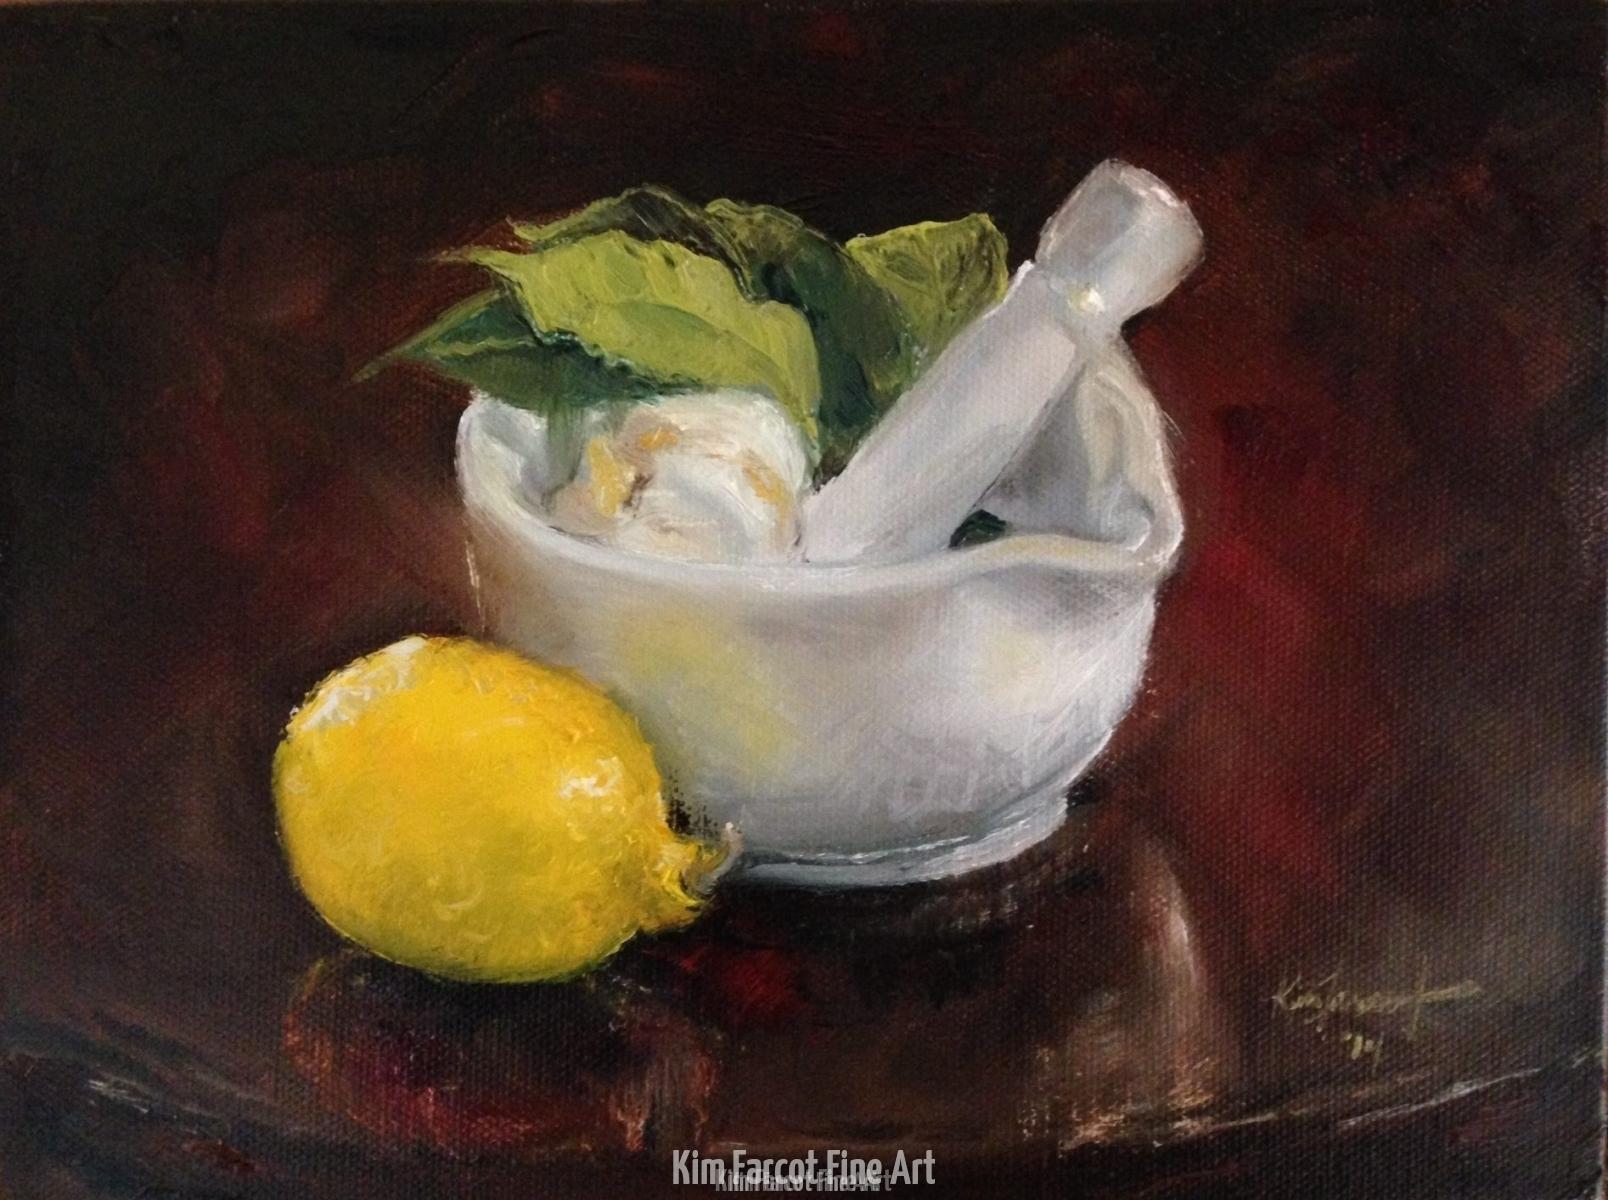 Lemon, Garlic, Bayleaf, private collection, Saudi Arabia